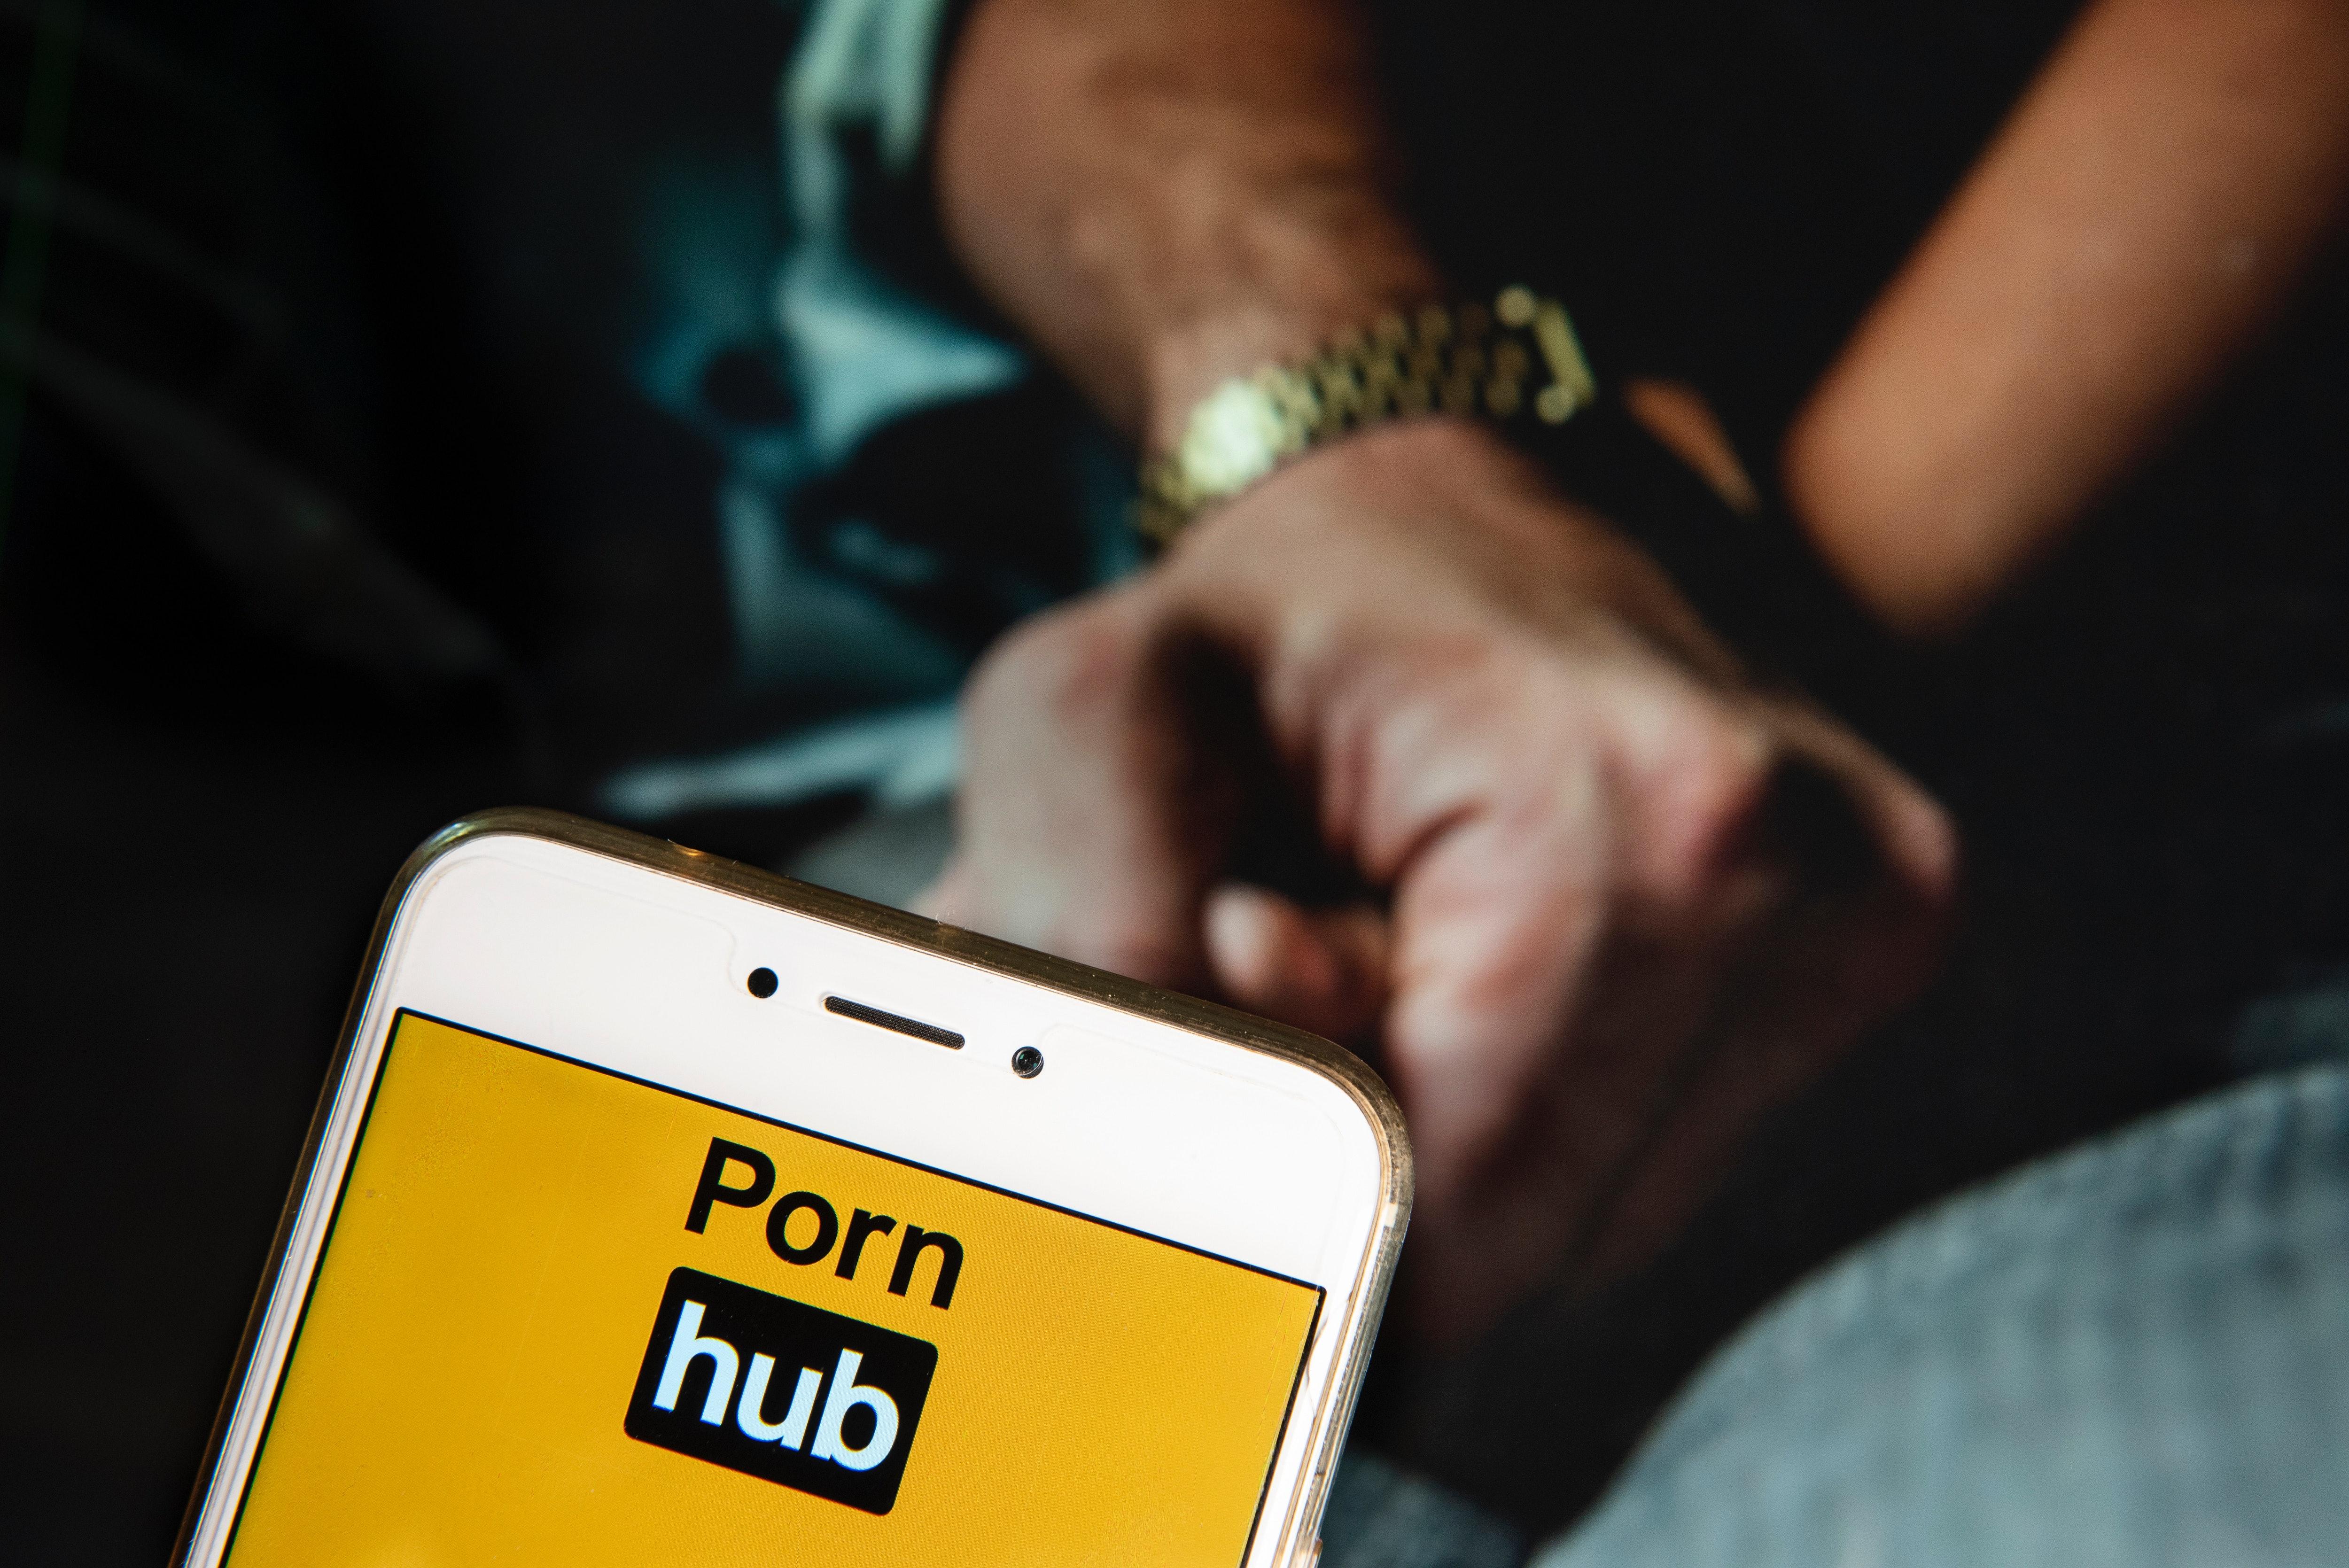 pornhub mobile